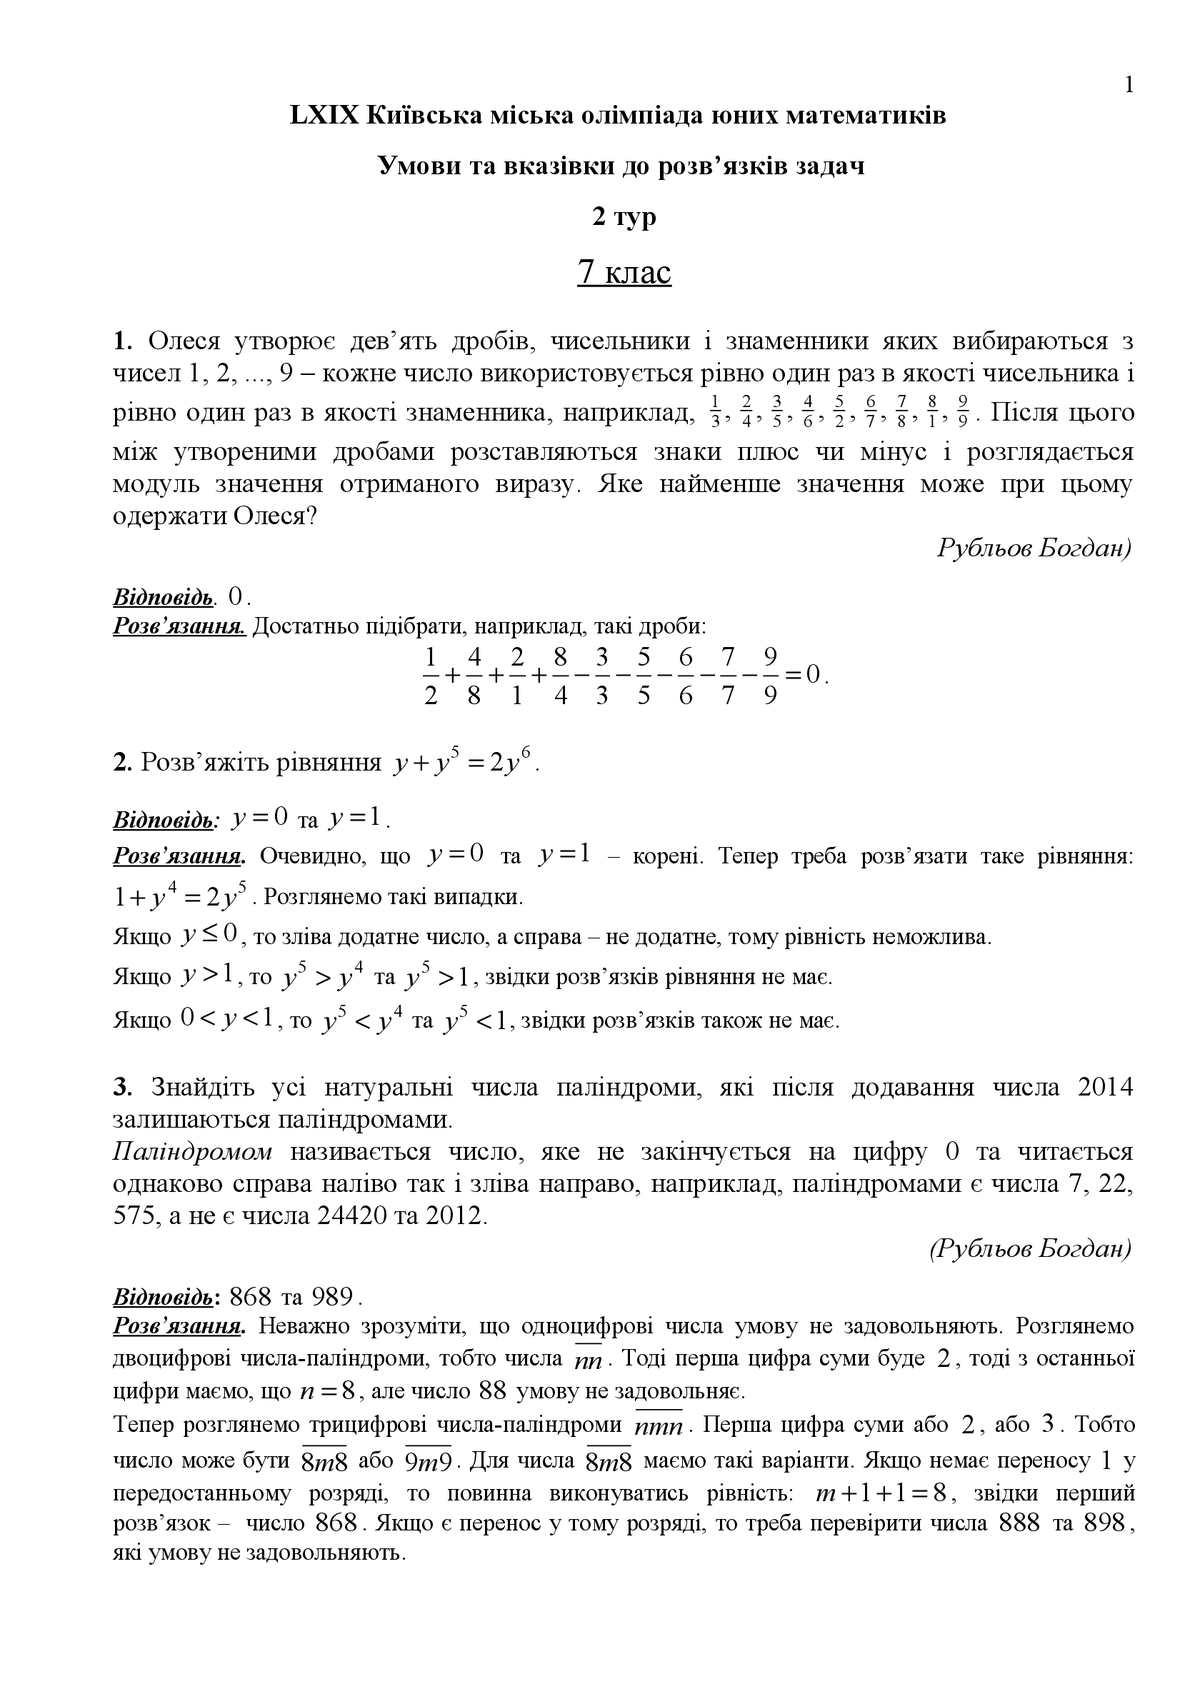 III-2014-2 (2 тур м.Київ)